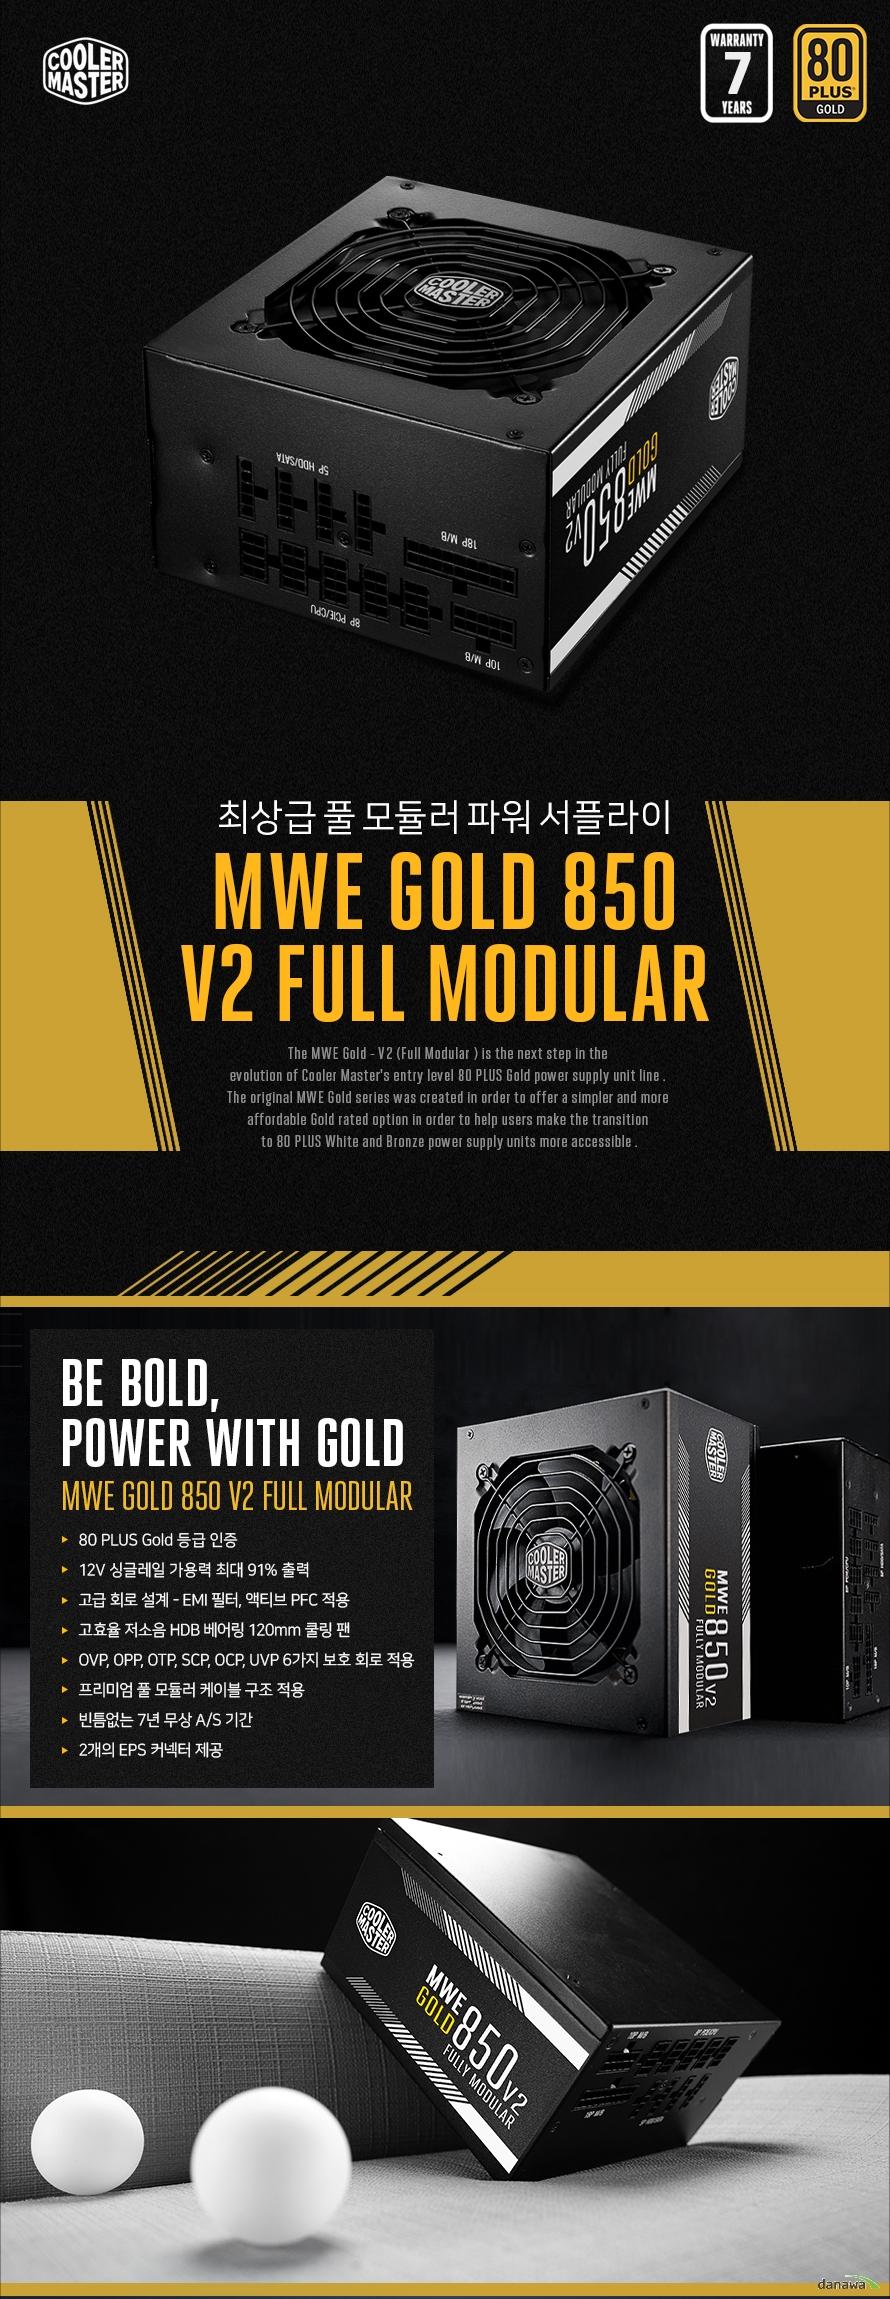 최상급 풀 모듈러 파워 서플라이 MWE GOLD 850 V2 FULL MODULAR BE BOLD, POWER WITH GOLD MWE GOLD 850 V2 FULL MODULAR 80 PLUS Gold 등급 인증 / 12V 싱글레일 가용력 최대 91% 출력  / 고급 회로 설계 - EMI 필터, 액티브 PFC 적용 /  고효율 저소음 HDB 베어링 120mm 쿨링 팬 / OVP, OPP, OTP, SCP, OCP, UVP 6가지 보호 회로 적용 / 프리미엄 풀 모듈러 케이블 구조 적용 /빈틈없는 7년 무상 A/S 기간 / 2개의 EPS 커넥터 제공  인텔® 10세대 및 AMD 4세대 라이젠TM,최신 프로세서를 완벽하게 호환합니다. MWE GOLD 850 V2 FULL MODULAR 는 INTEL LGA1200 소켓과 AMD AM4 소켓을 모두 지원합니다.  91% High Efficiency 높은 에너지 전환 효율로 전력 누수량을 줄여주어 유지 비용 감소와 에너지 절약, 안정적인 성능을 모두 제공합니다. 80 PLUS GOLDCERTIFIED  고성능 고효율 파워 서플라이MWE GOLD 850V2 FULL MODULAR MWE GOLD 850 V2 은 싱글레일 설계 최대 +12V 가용력 91% 출력으로 시스템 내부 주요 부품인 CPU와 그래픽카드에 안정적인 전기를 공급합니다. 또한, 시스템의 튼튼한 심장부 역할을 하여 PC 수명을 더욱 향상시킵니다.  쿨러마스터만의 탁월한 기술력High Quality Parts 파워 서플라이의 품질은 시스템의 수명에 직접적인 영향을 미칩니다. 내부 하드웨어에 안정적인 전력 공급을 위하여 최상급 부품만을 사용한 MWE GOLD 850 V2 FULL MODULAR 로 안정적인 시스템을 구축해보세요.   2 EPS CONNECTORS MWE GOLD 850 V2은  최신 마더 보드와 호환성을 보장하기 위해 2개의 EPS 커넥터가 표준으로 장착됩니다. 충분한 커넥터가 있는지 걱정 없이 최소 550W 에서 최대 850W까지 사용 가능합니다.  QUIET COOLING MWE GOLD 750 V2는 HDB 팬으로 업그레이드되었습니다. 파워서플라이의 로드율에 맞게 HDB 팬 속도가 변하여 뛰어난 저소음 환경을 제공합니다.  HIGH TEMPERATURE RESILIENCE MWE Gold V2는 기존 MWE GOLD 보다 작동 온도가 5℃ 더 상승하여 최대 50℃까지 오버클럭 및 기타 높은 로드율 작업에서 안전한 작동이 가능합니다.  친환경적인 에너지 사용 그린 파워 서플라이 Green power supply with ErP 2014 certified MWE GOLD 850 V2는 에너지 효율이 뛰어난 그린 파워 서플라이 제품으로, 대기전력을 0.5W 미만으로 유지하여 불필요한 전력 낭비를 방지하고  EU의 효율 요구 법규인 ErP (Energy-relalted Product)를 만족하여  친환경적 에너지로 장기적인 에너지 사용에 뛰어난 효율을 자랑합니다.  표준 ATX 규격 사이즈 160 x 150 x 86mm MWE GOLD 850 V2 은 다양한 크기의 케이스에 호환되며  그중에서도 미들타워형 케이스에 최적화된 사이즈로 제작되었습니다.  ATX 파워 서플라이를 지원하는 케이스에 모두 장착할 수 있습니다.   MWE GOLD 850 V2 FULL MODULAR HIGH-END & Advanced Circuit Design  안정성을 위한 6가지 보호 회로 내장 Multiple Protection Design 극한의 환경에서 최고의 안정성을 유지하기 위해 과전압 보호, 저전압 보호,  과열 보호, 과전력 보호, 단락 회로 보호, 과전류 보호 총 6가지 보호 기능이 탑재되어 PC 사용 중에  발생할 수 있는 여러가지 위협으로 부터 사용자의 시스템을 안전하게 보호합니다.   OVP 과전압 보호 출력 전압이 초과될 시 차단하여 보호 OPP 과전력 보호 입력 전압 범위에서 출력 전력 제한 OTP 과열 보호 내부 과열 현상을 사전 방지하는 기능 OCP 과전류 보호 출력 전류를 제한하여 내부 부품 보